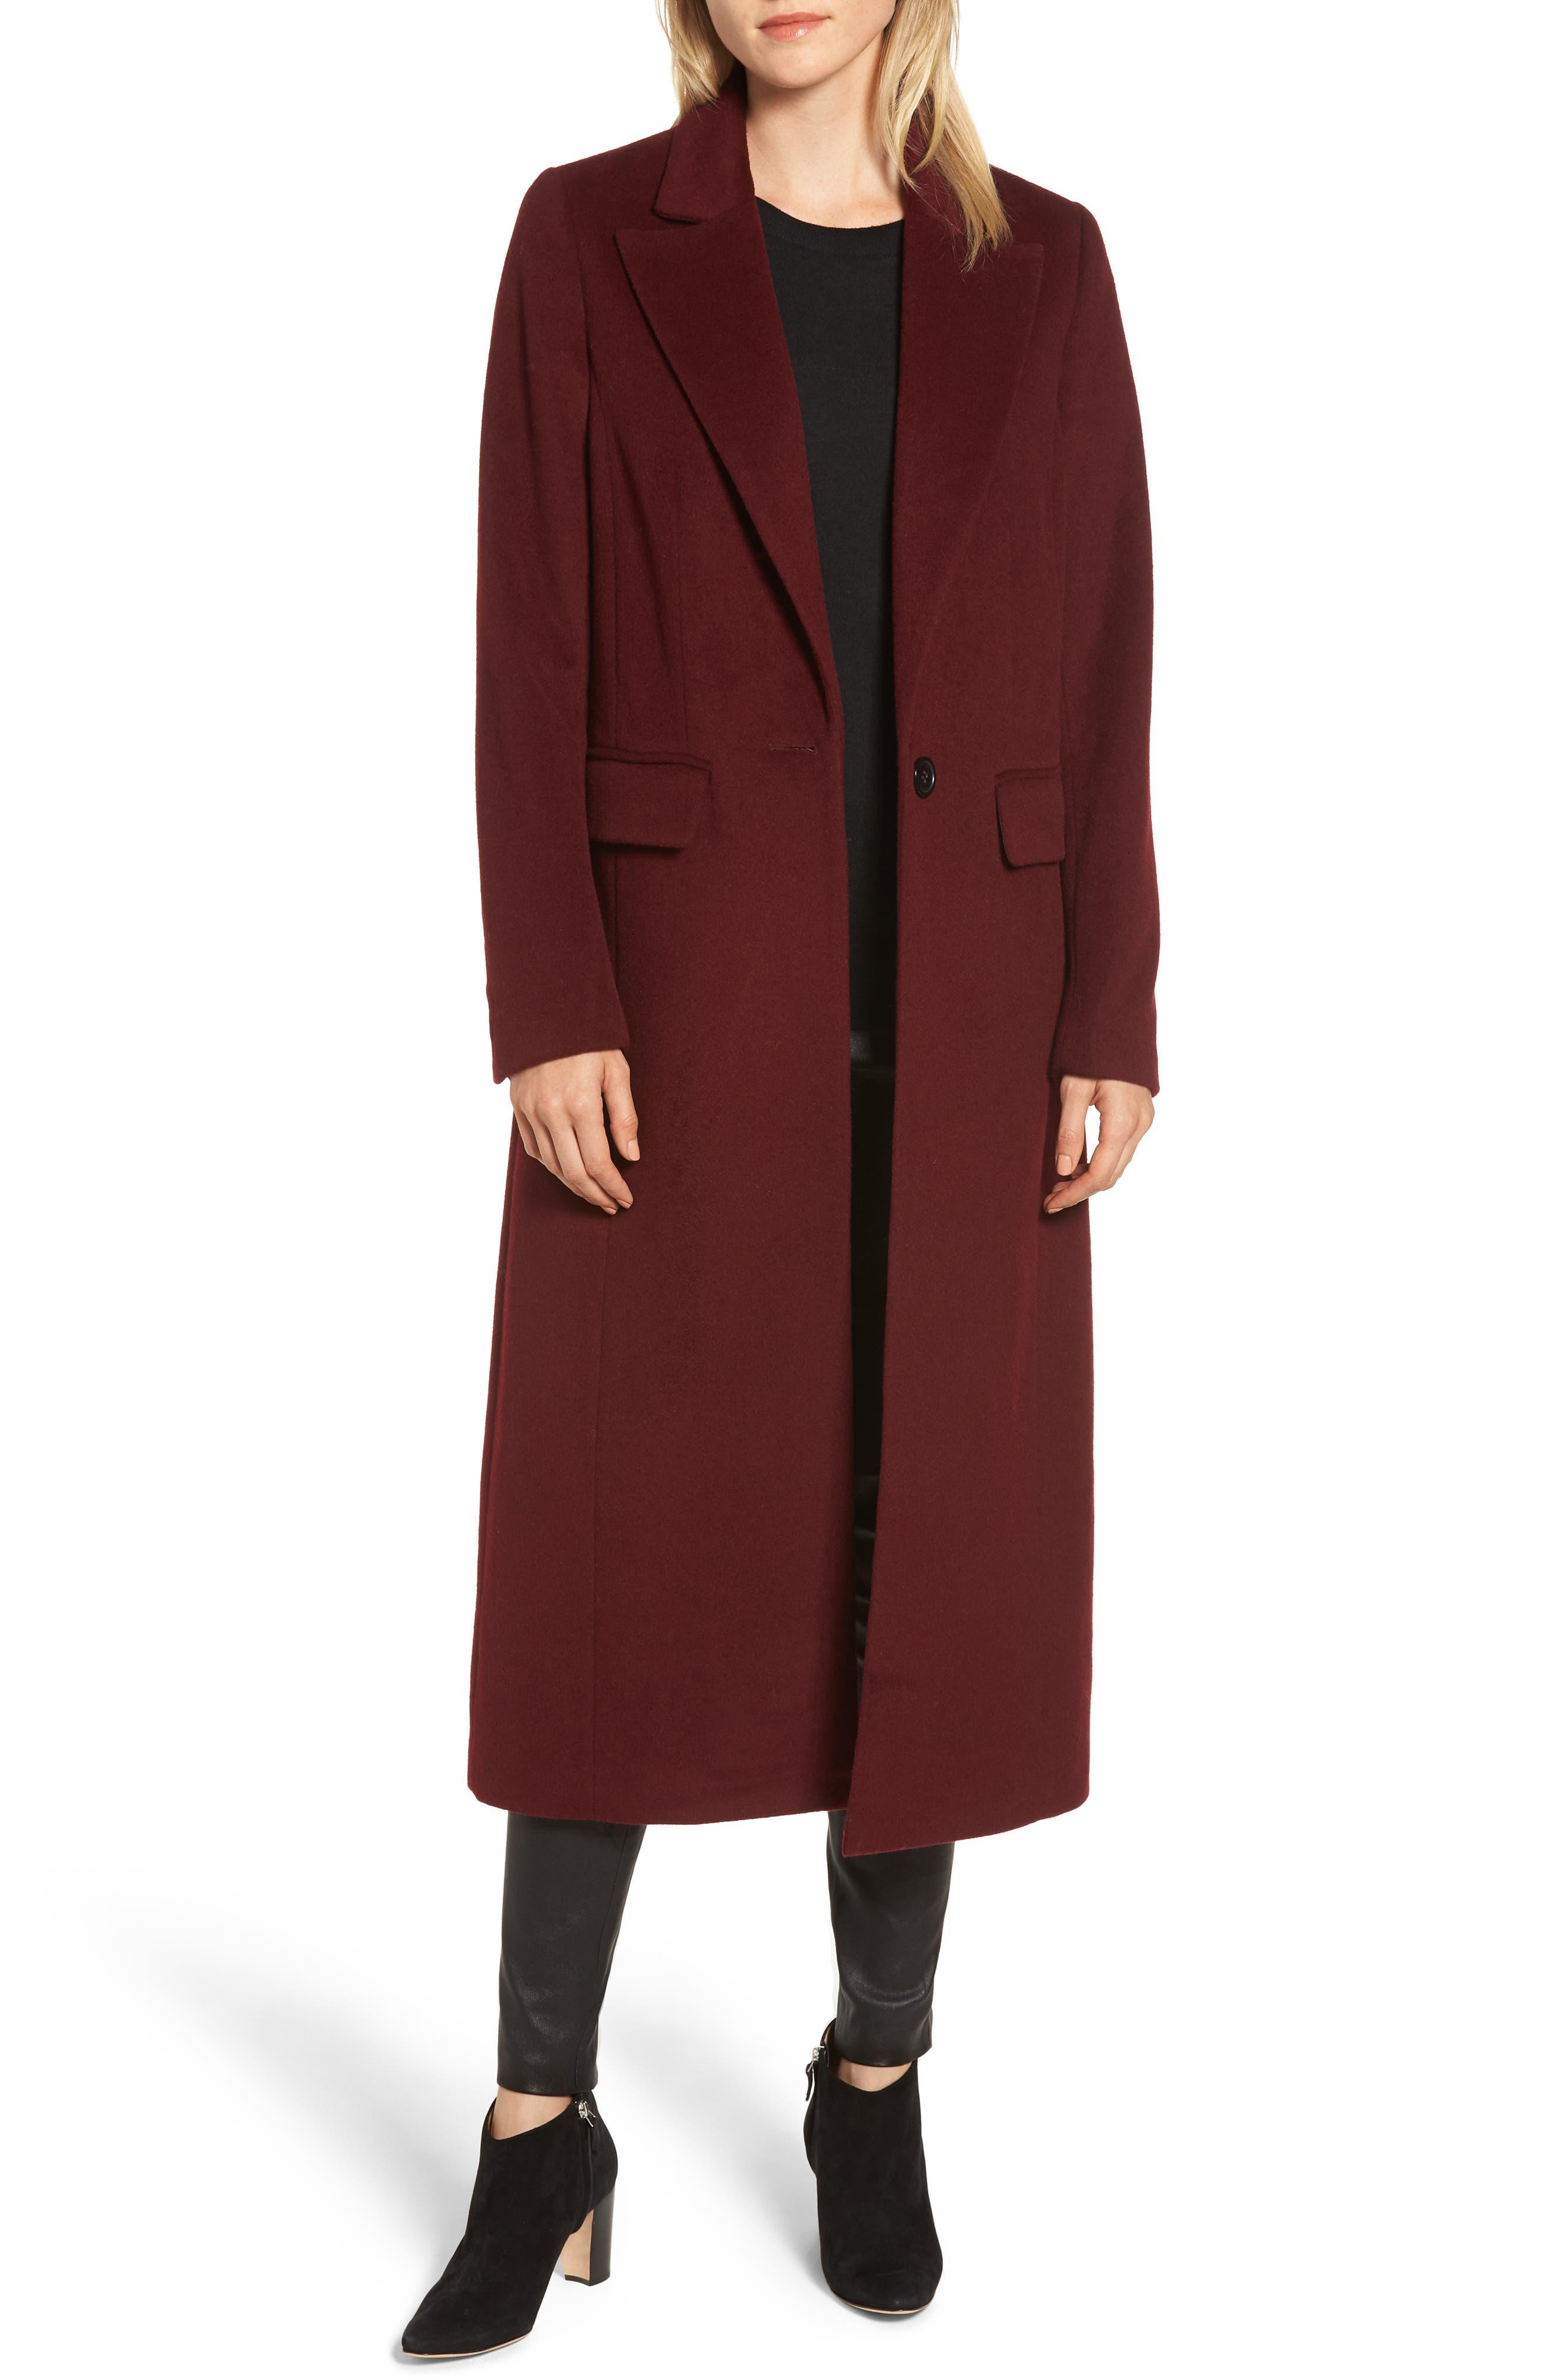 Wool Blend Menswear Coat,                             Main thumbnail 1, color,                             BURGUNDY